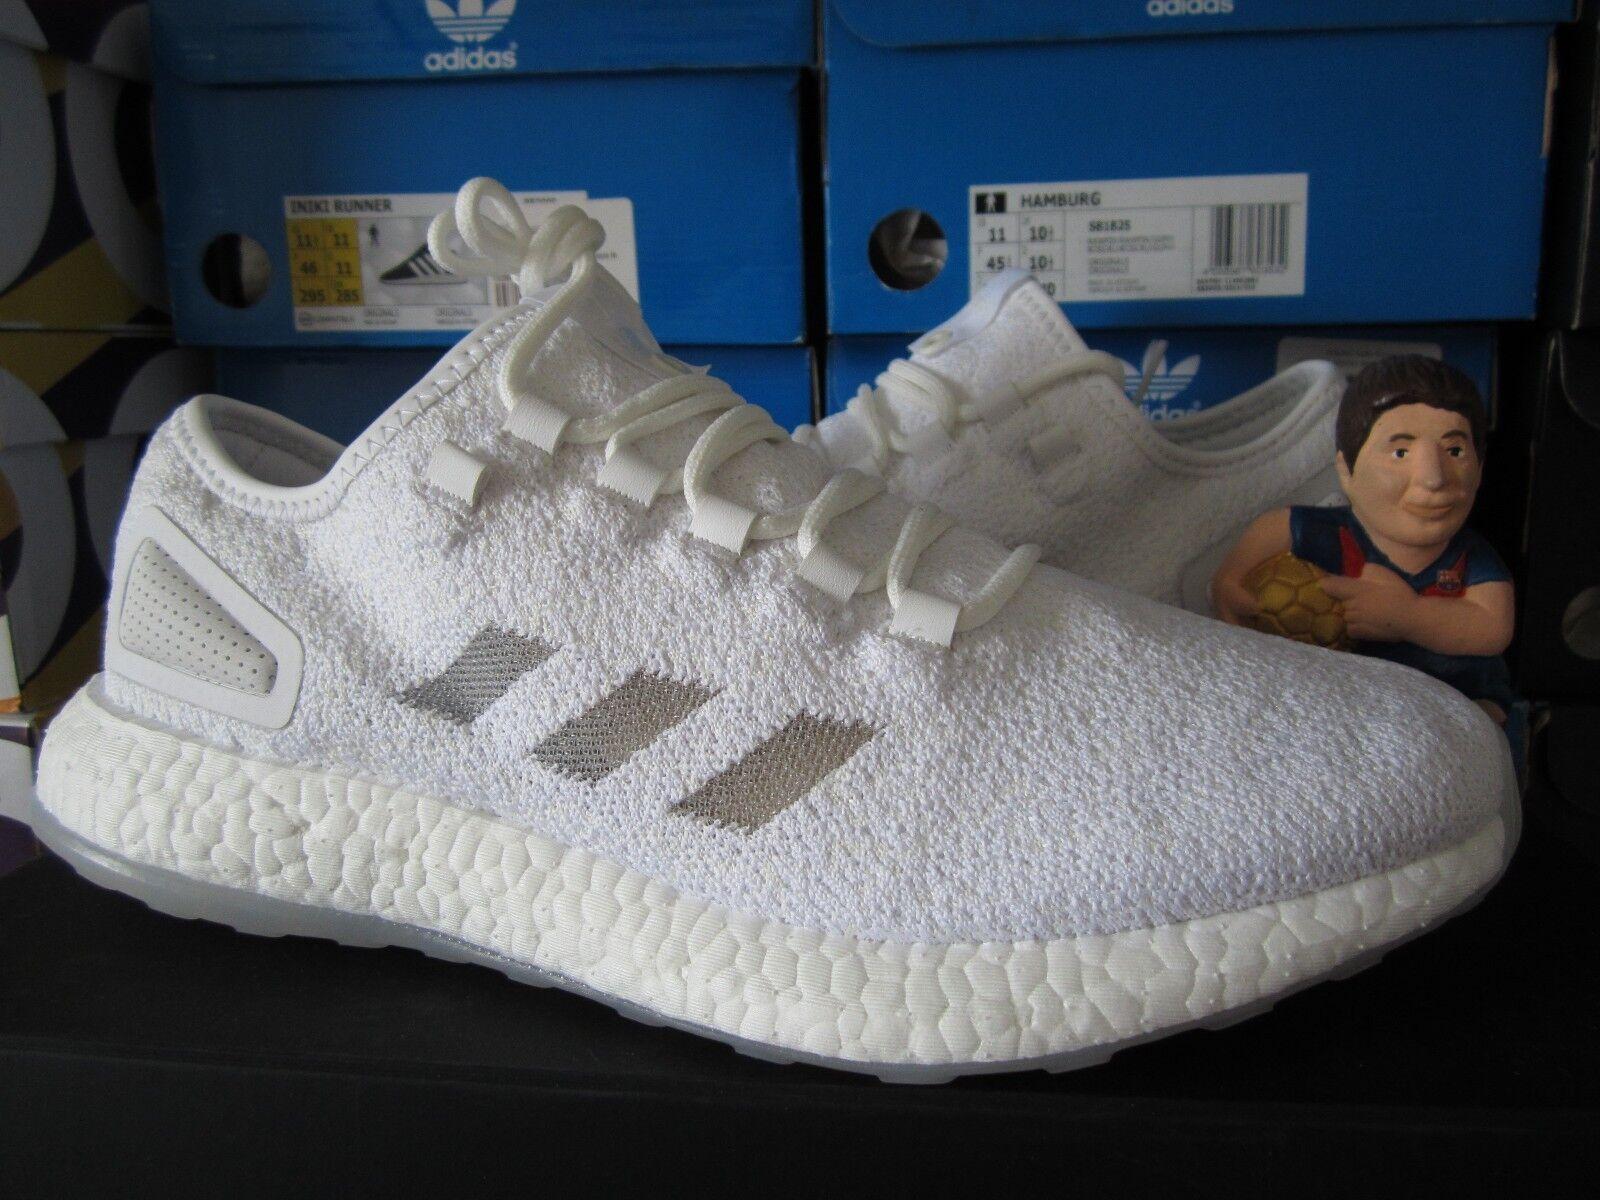 Adidas Consortium Sneakerboy x Wish ATL Pureboost S.E. Glow S80981 US 11